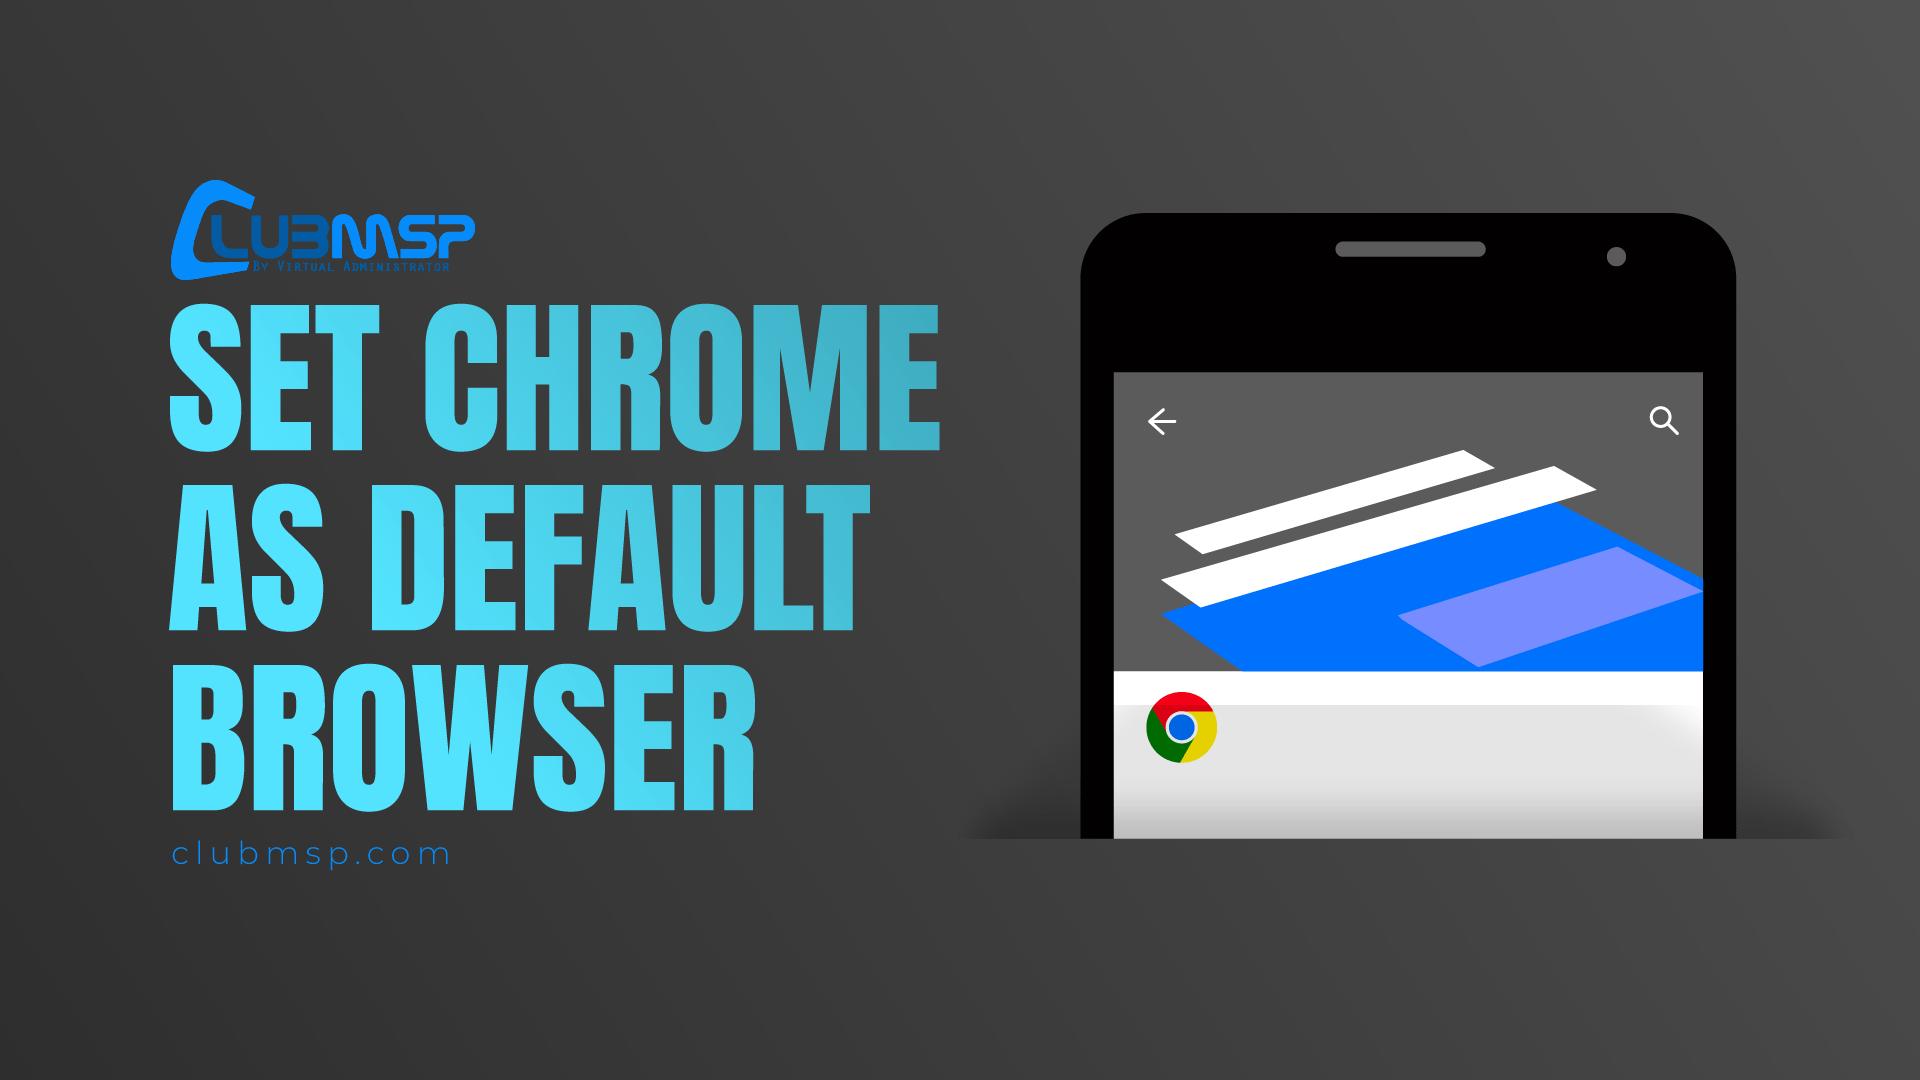 Set Chrome As the Default Browser